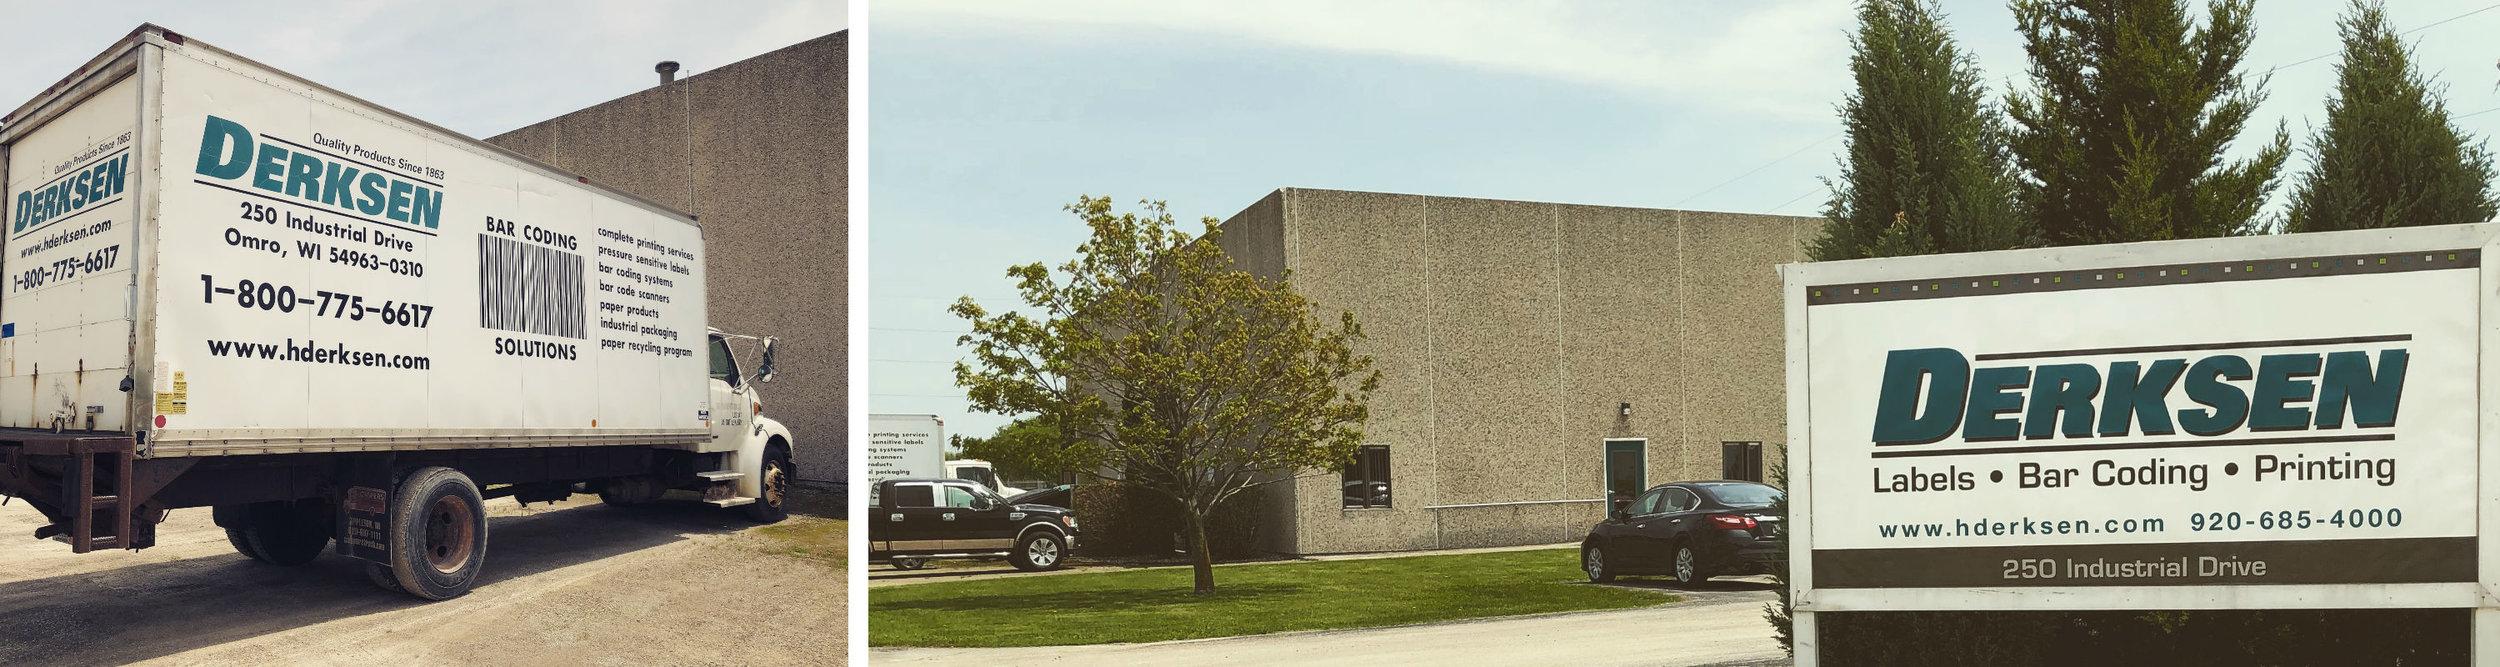 Derksen Co. facility in Omro, Wisconsin